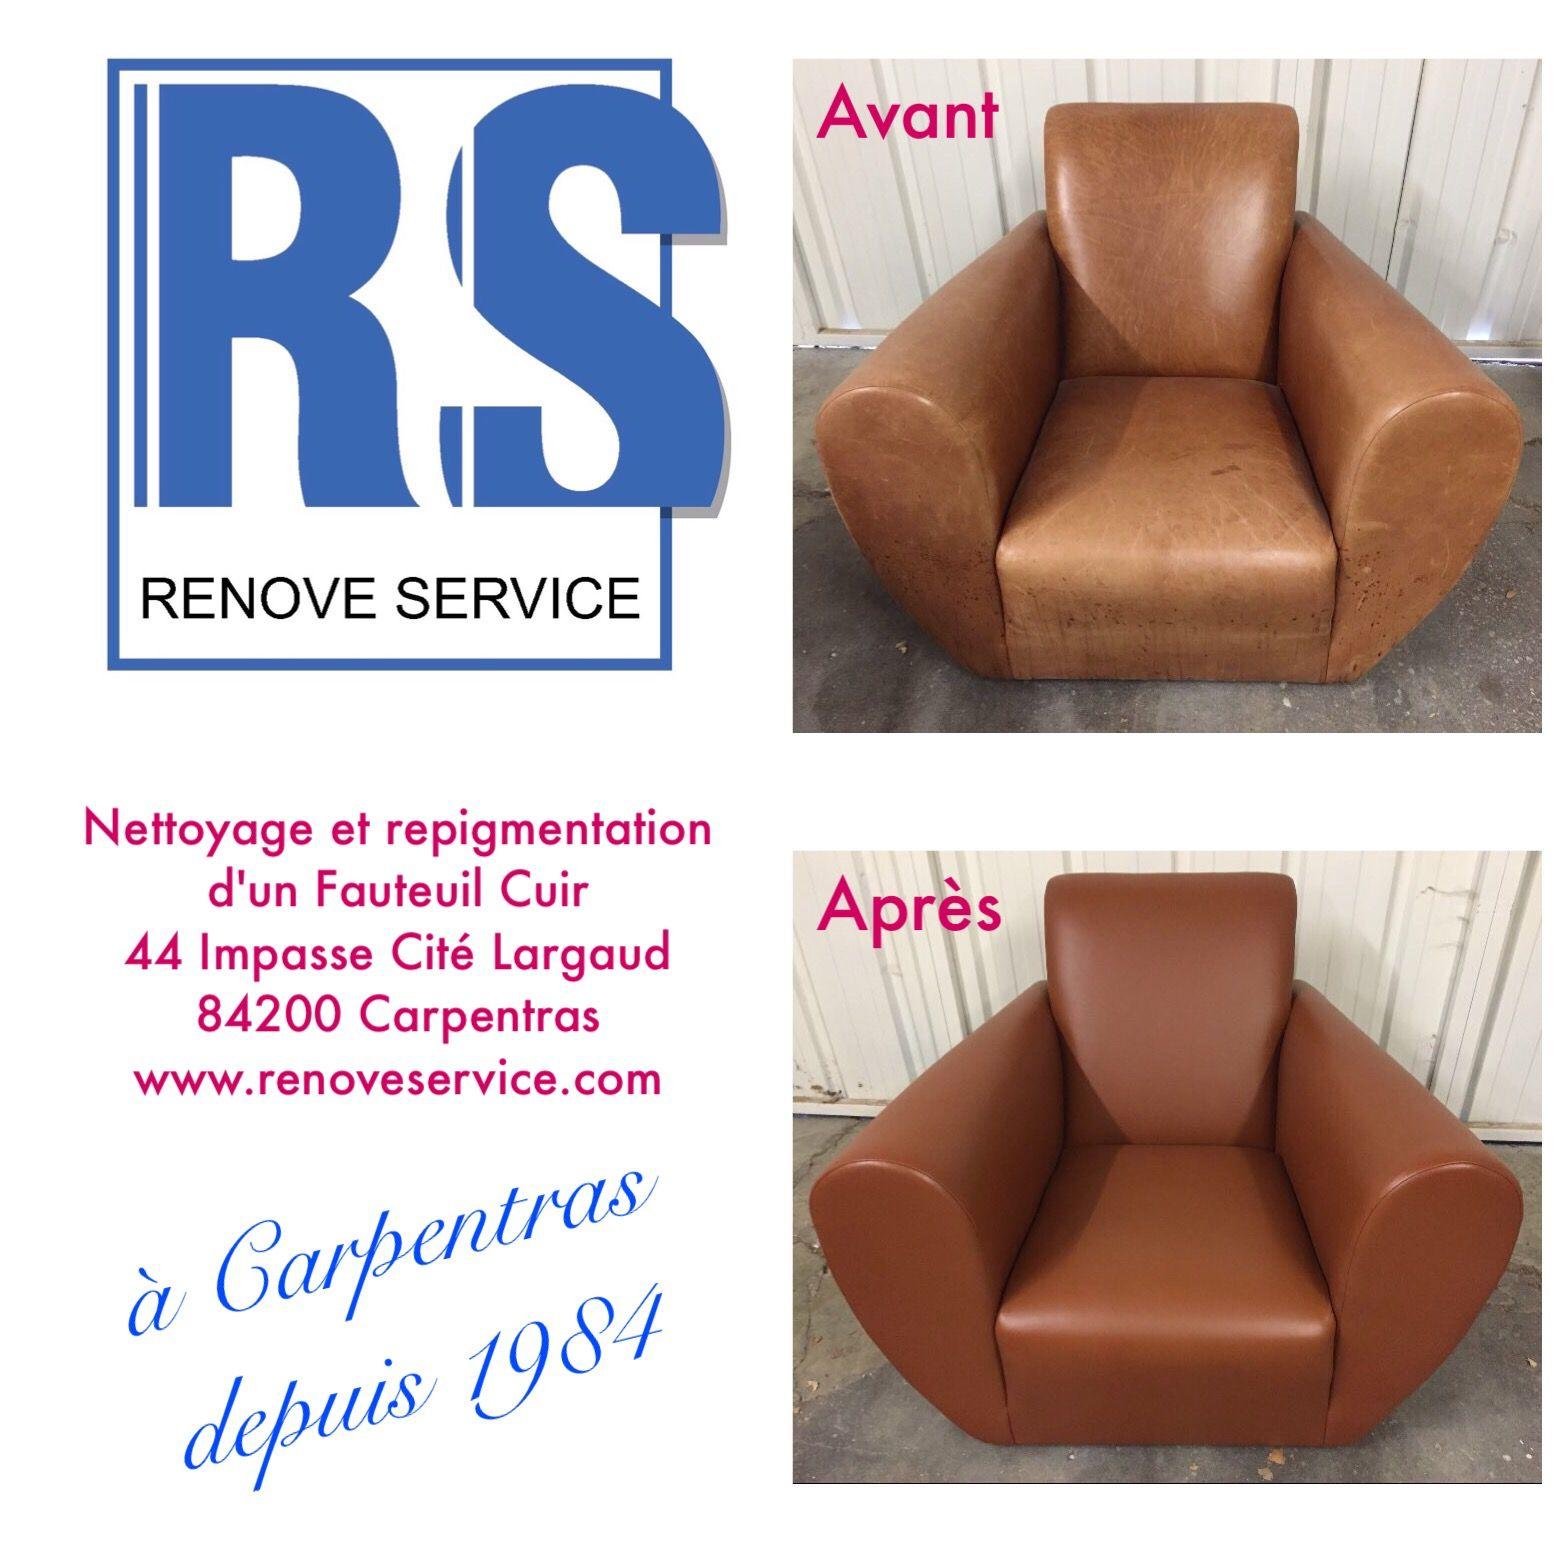 Nettoyer Fauteuil En Cuir renove service ( carpentras - vaucluse ) : www.renoveservice